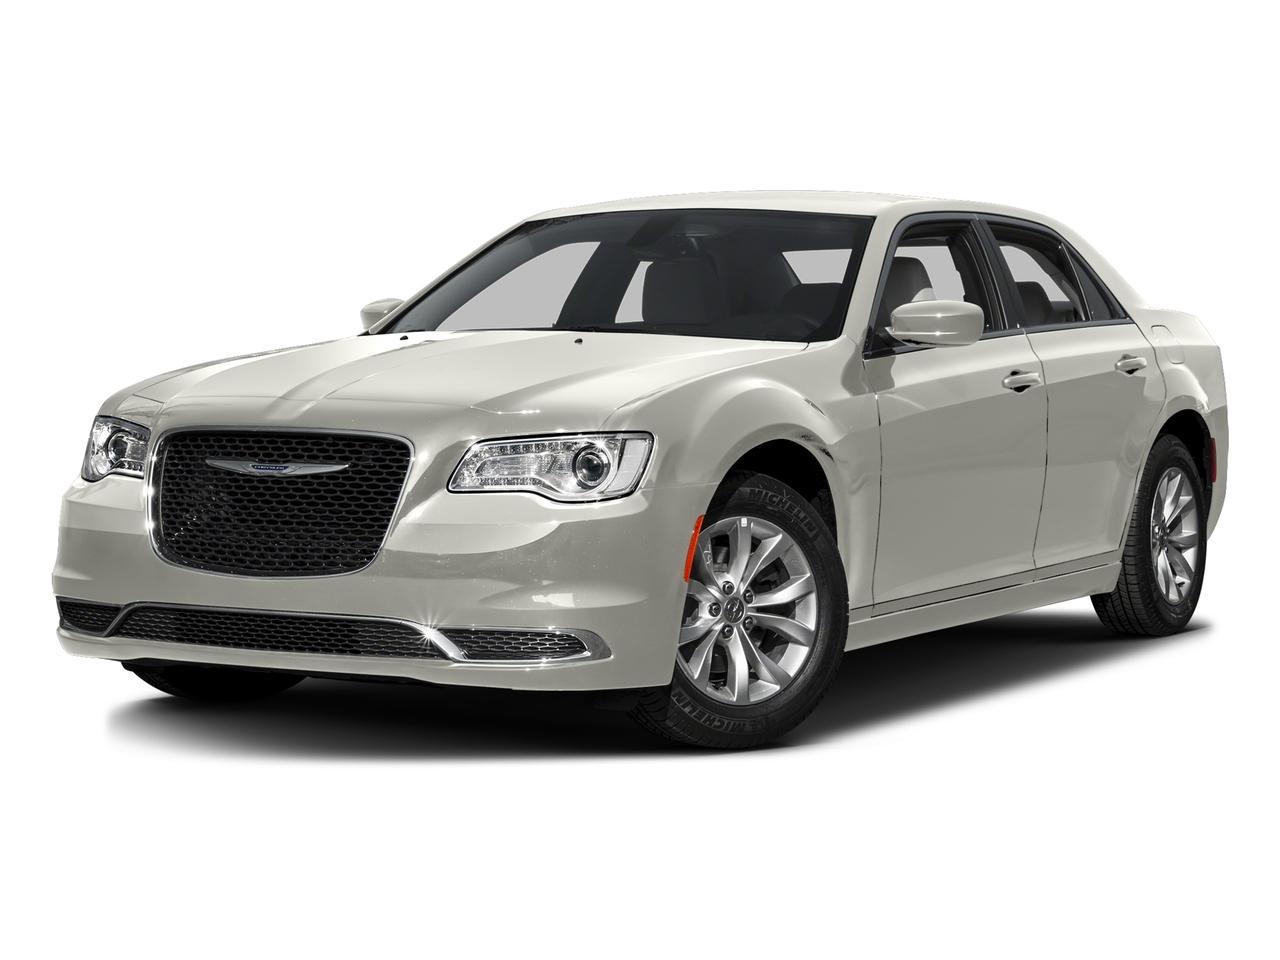 2016 Chrysler 300 Vehicle Photo in SELMA, TX 78154-1459